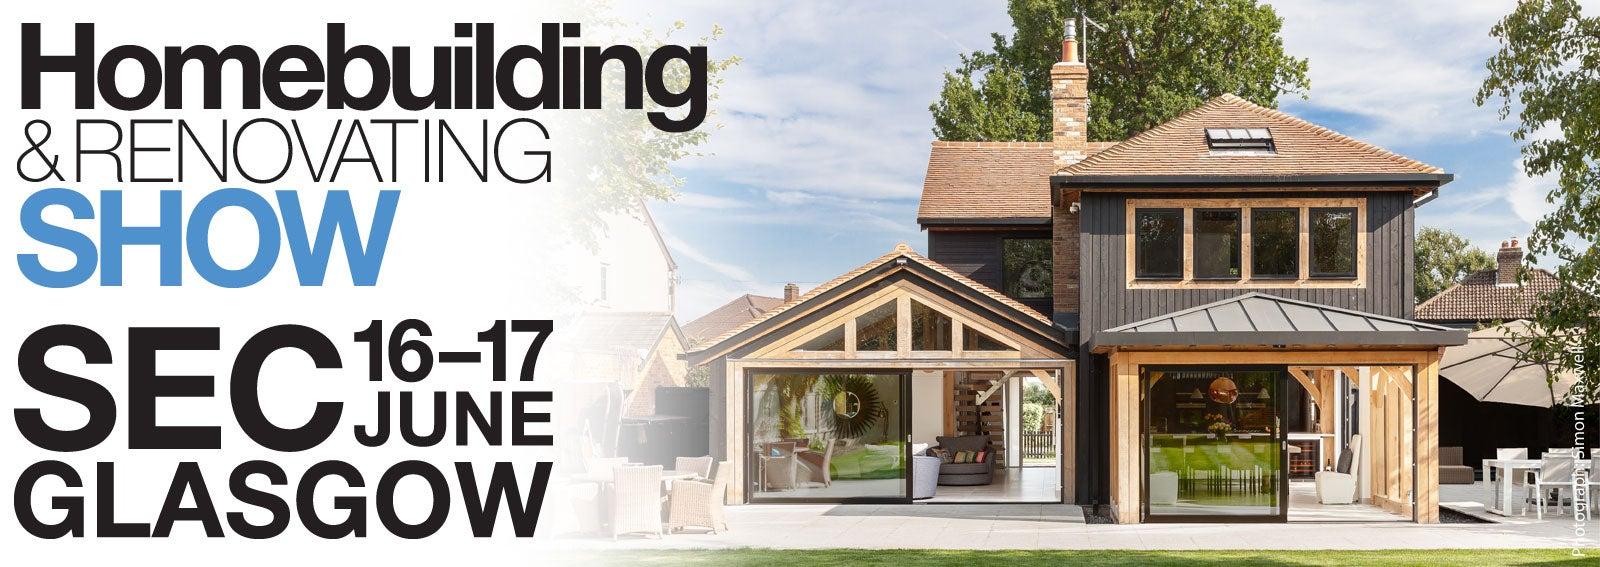 homebuildingandrenovatingshow_1600x567 (1).jpg